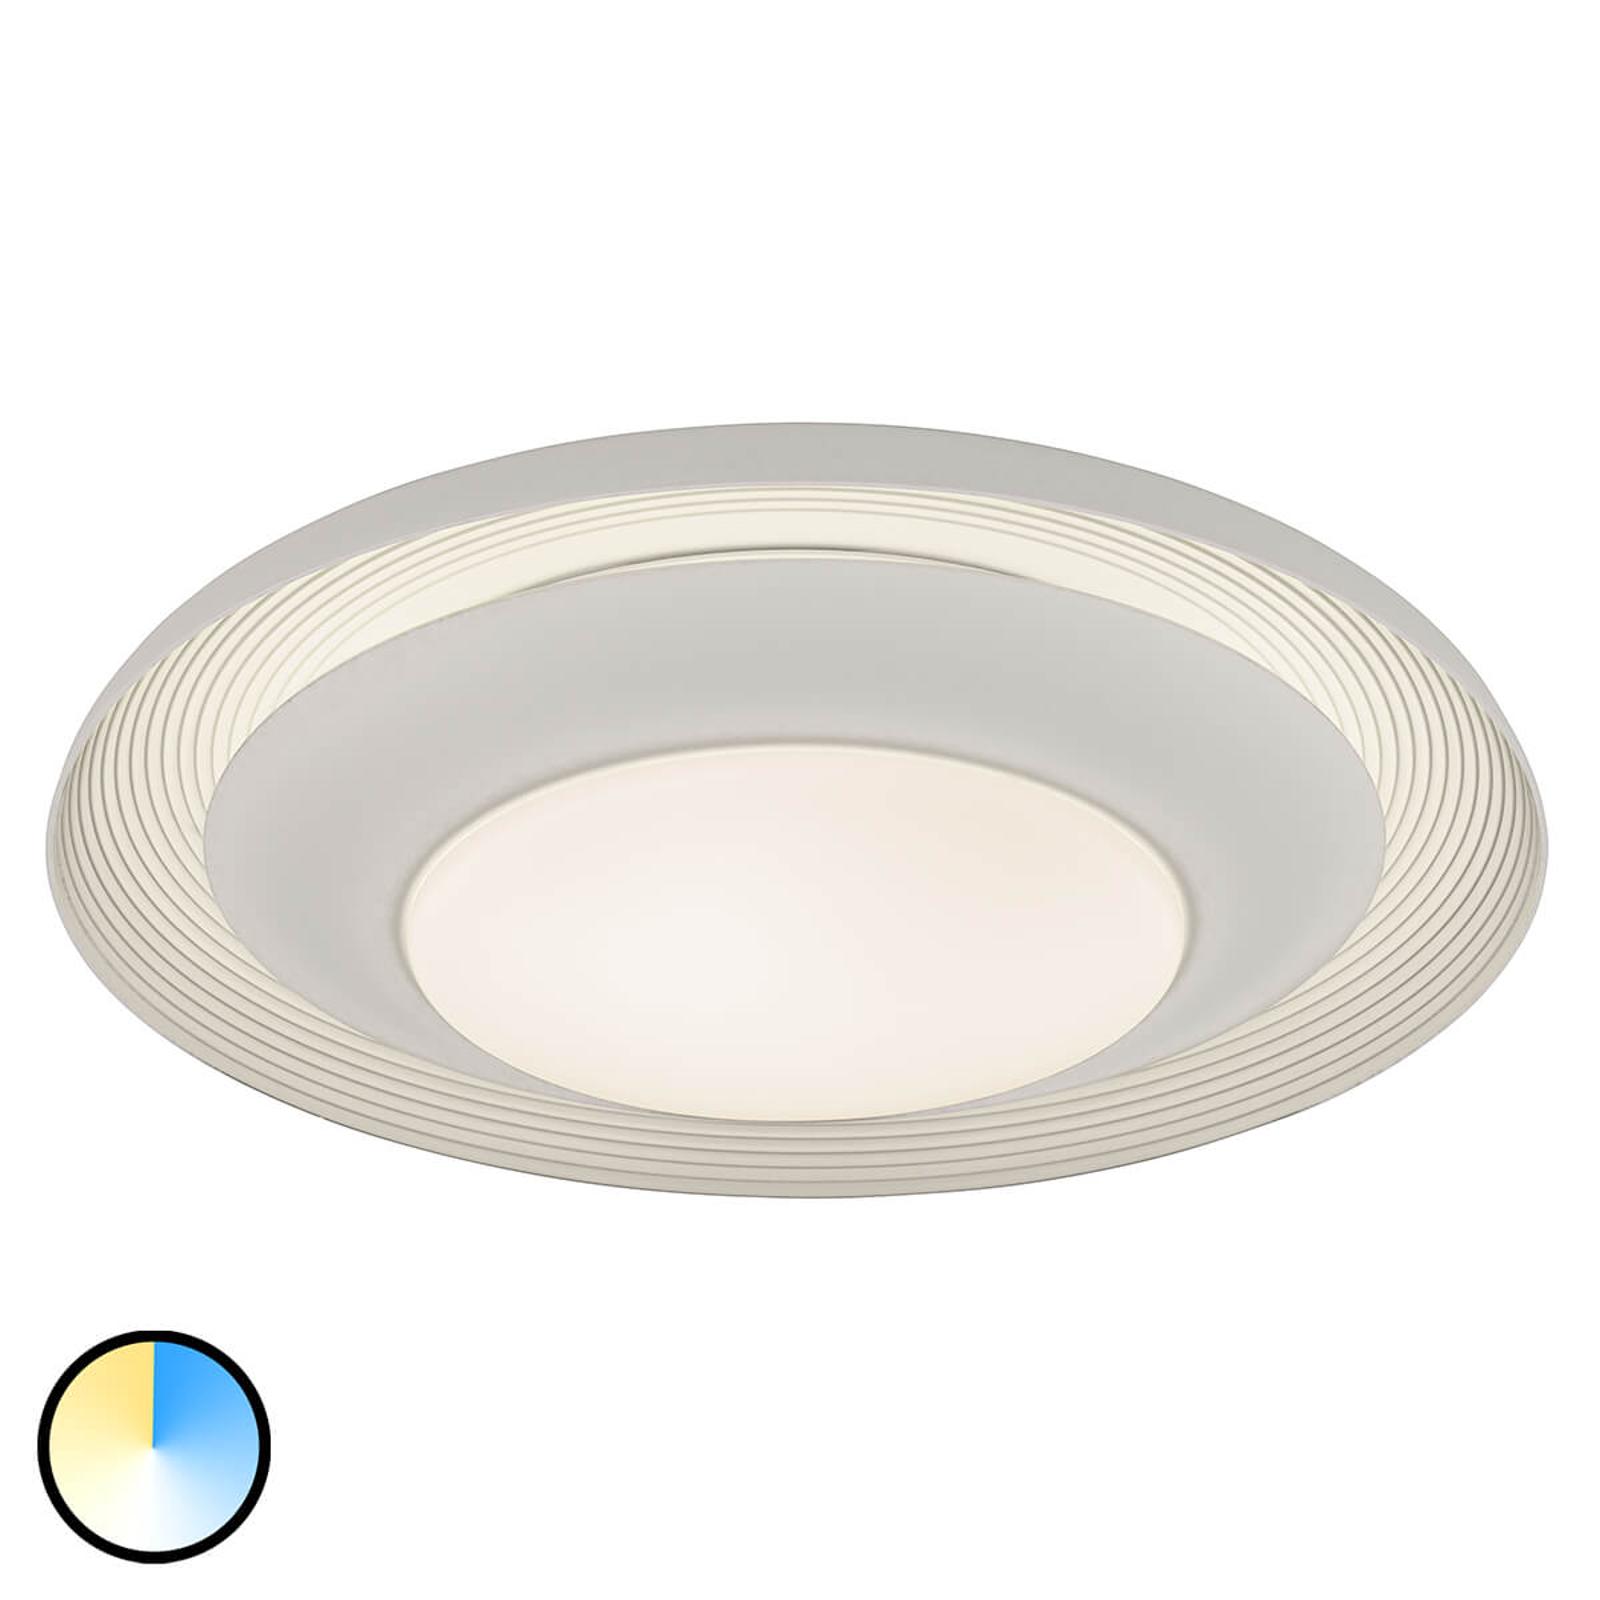 Lysfarge kan skiftes - LED-taklampe Canicosa